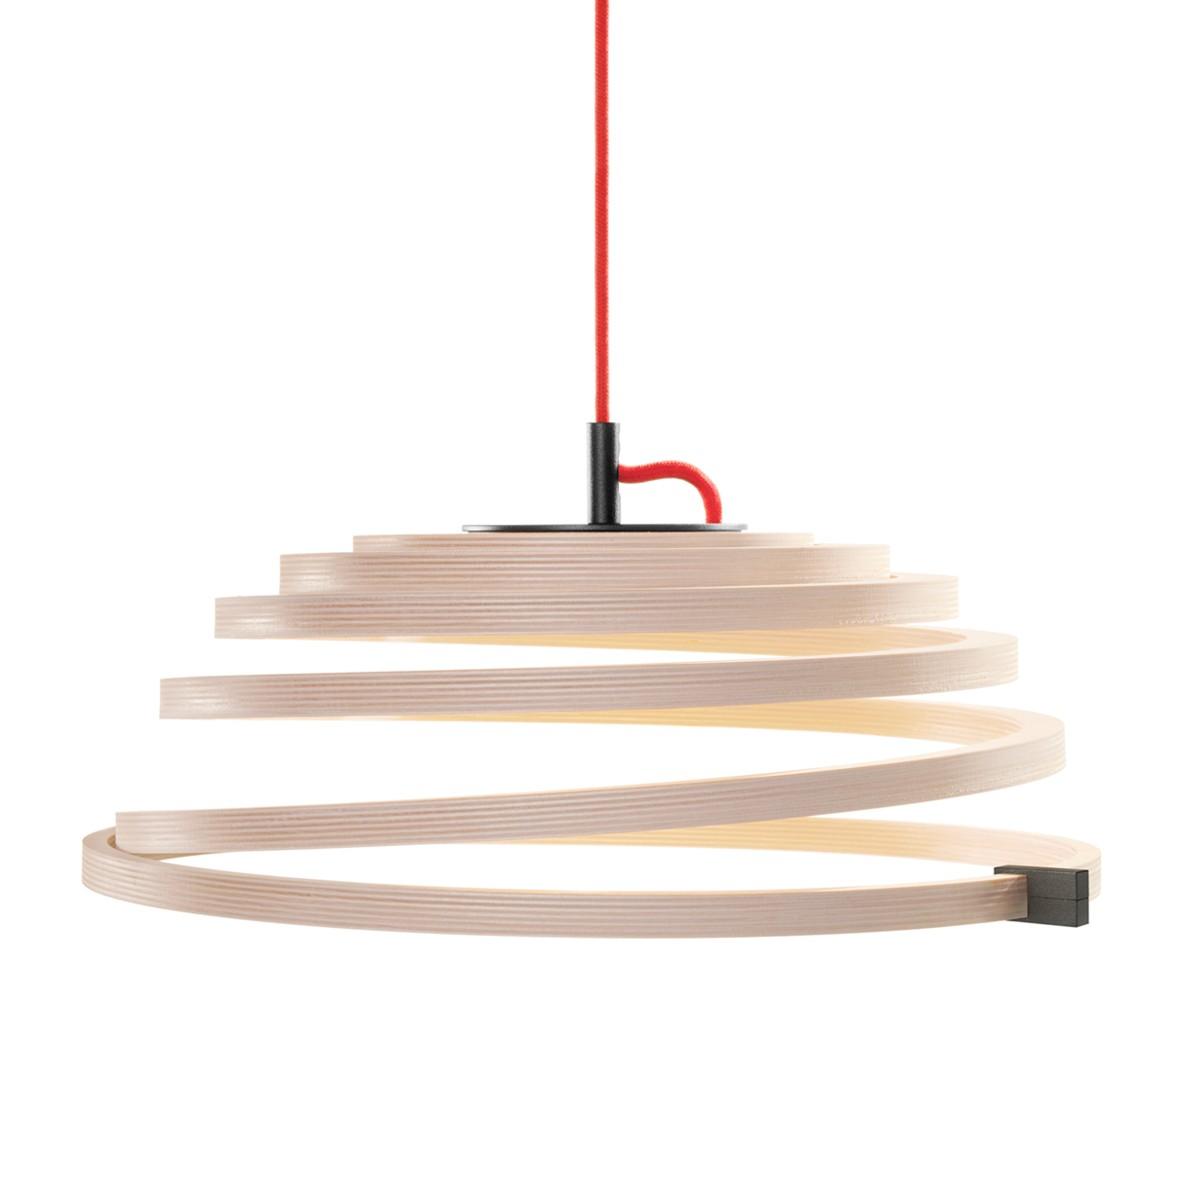 Secto Design Aspiro 8000 Pendelleuchte, Birke natur, Kabel: rot